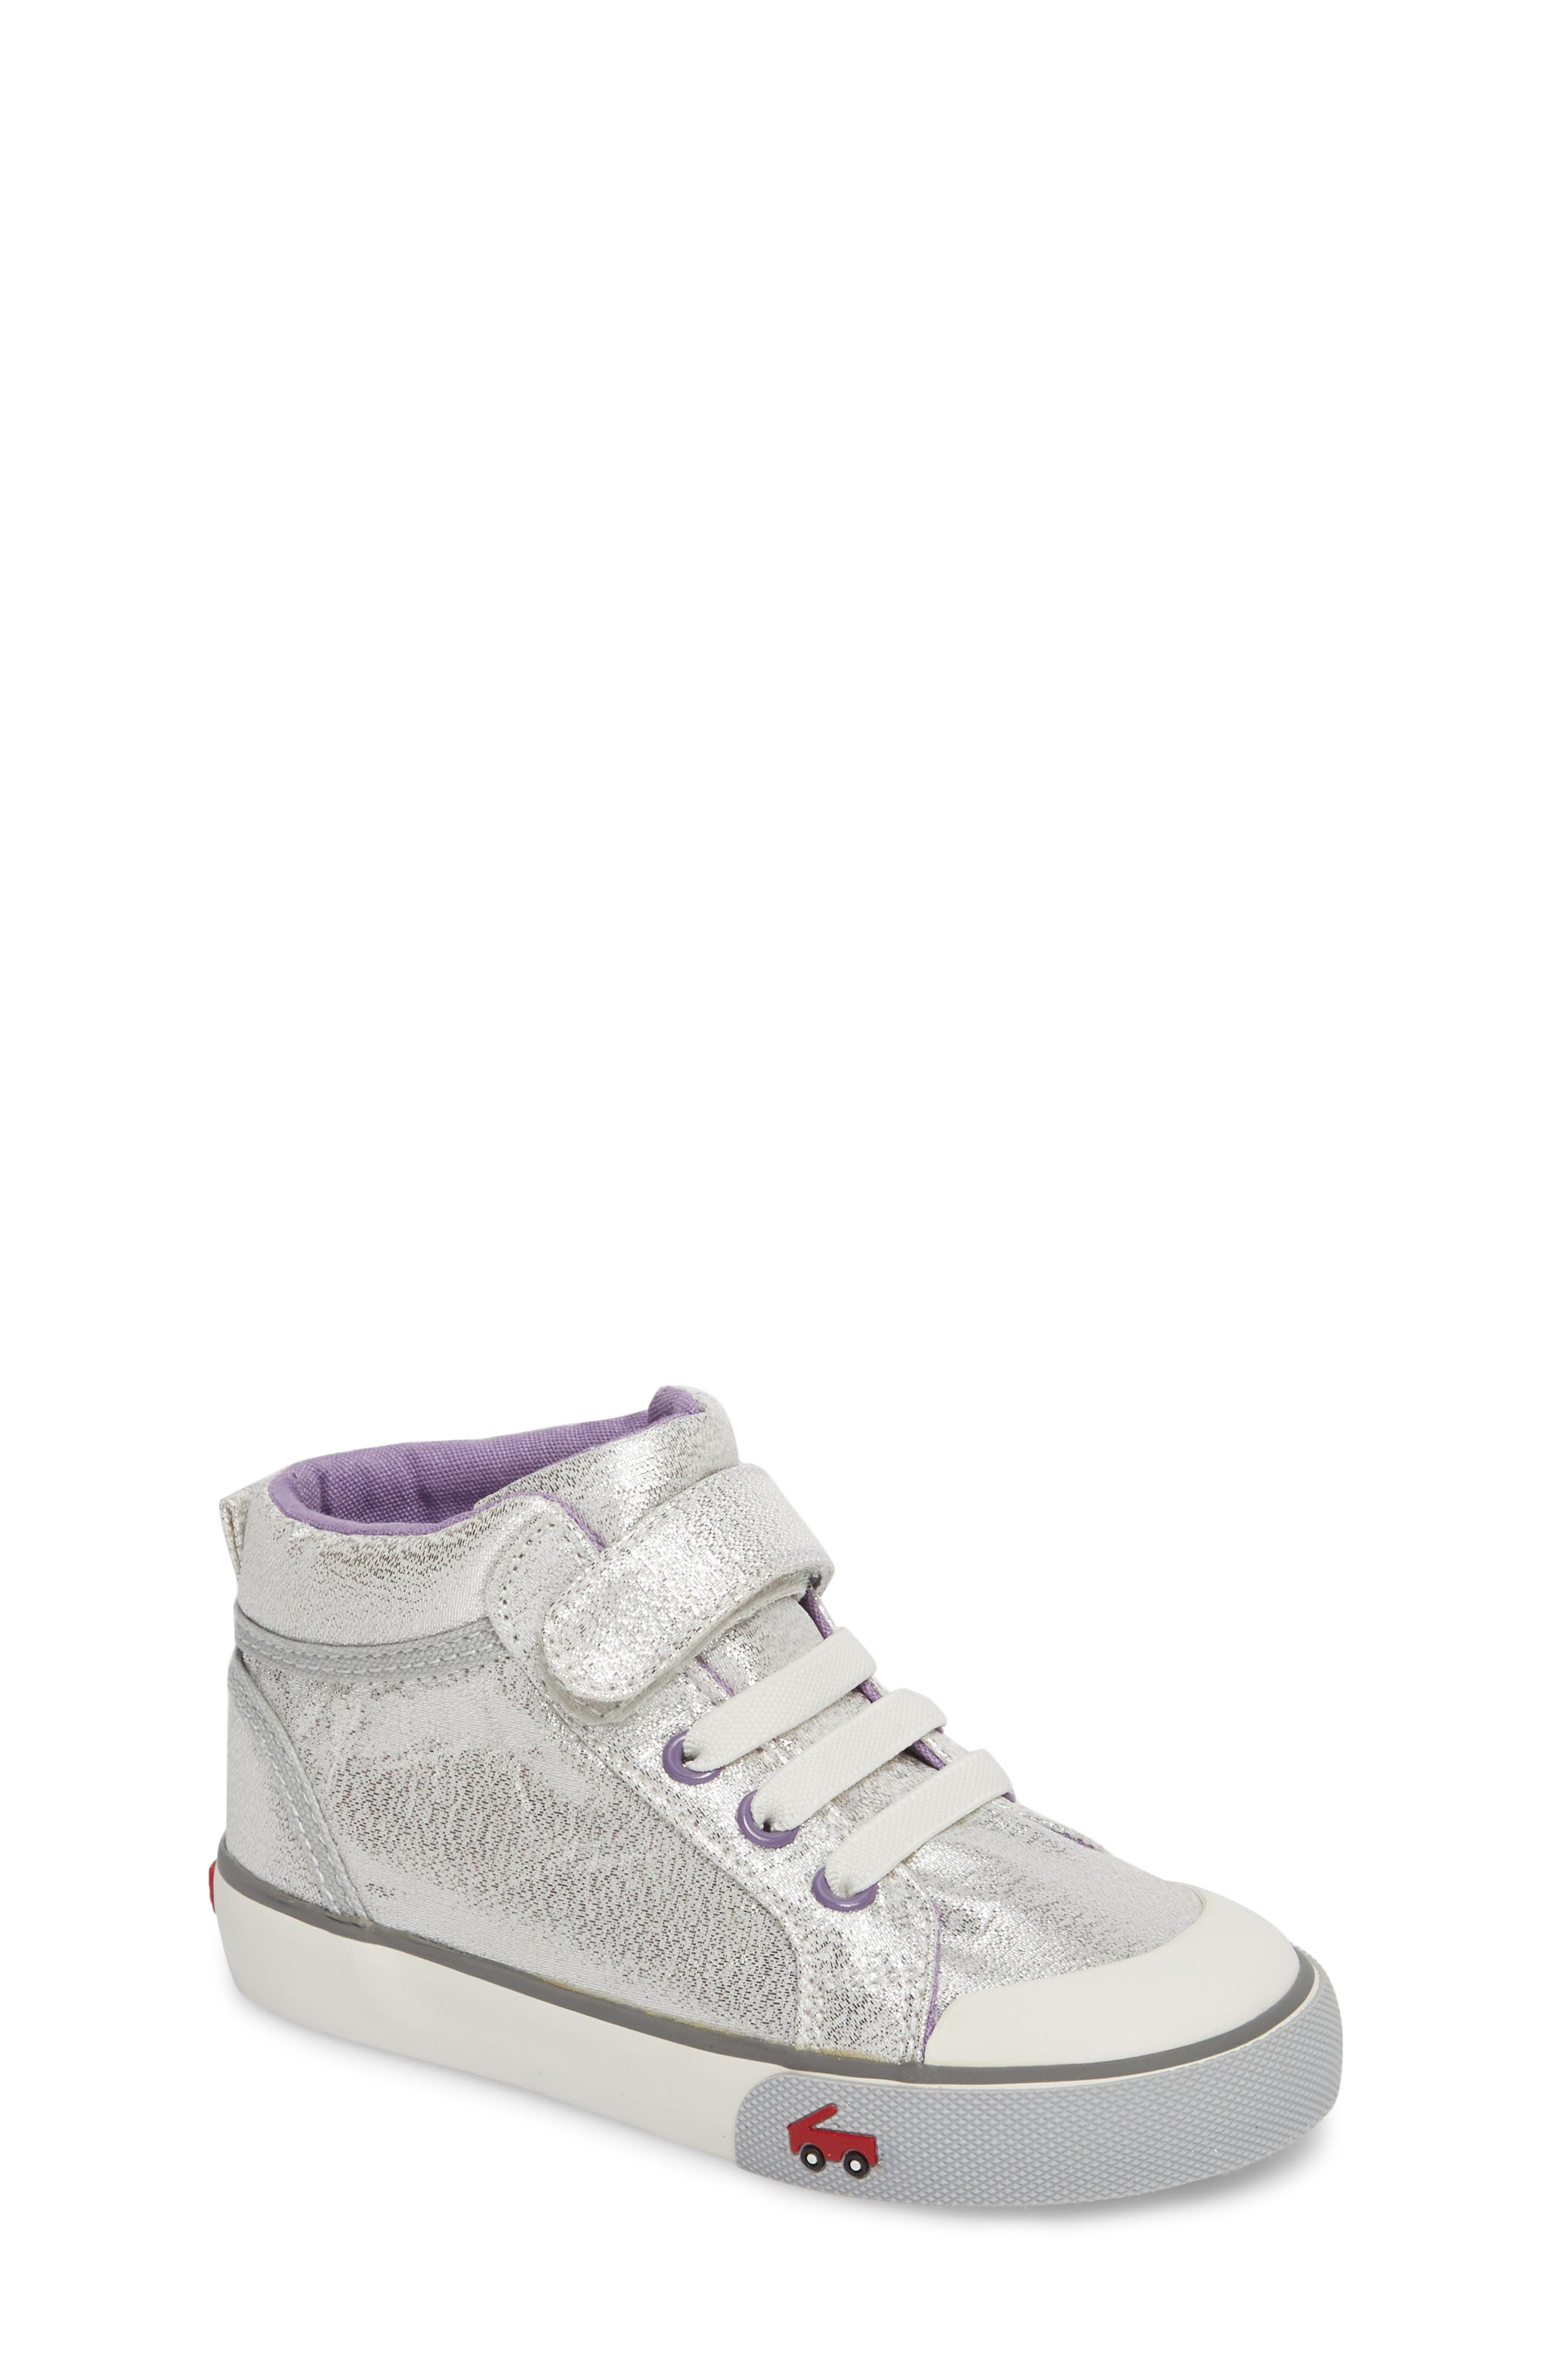 Peyton Metallic Mid Top Sneaker,                         Main,                         color, SILVER GLITTER